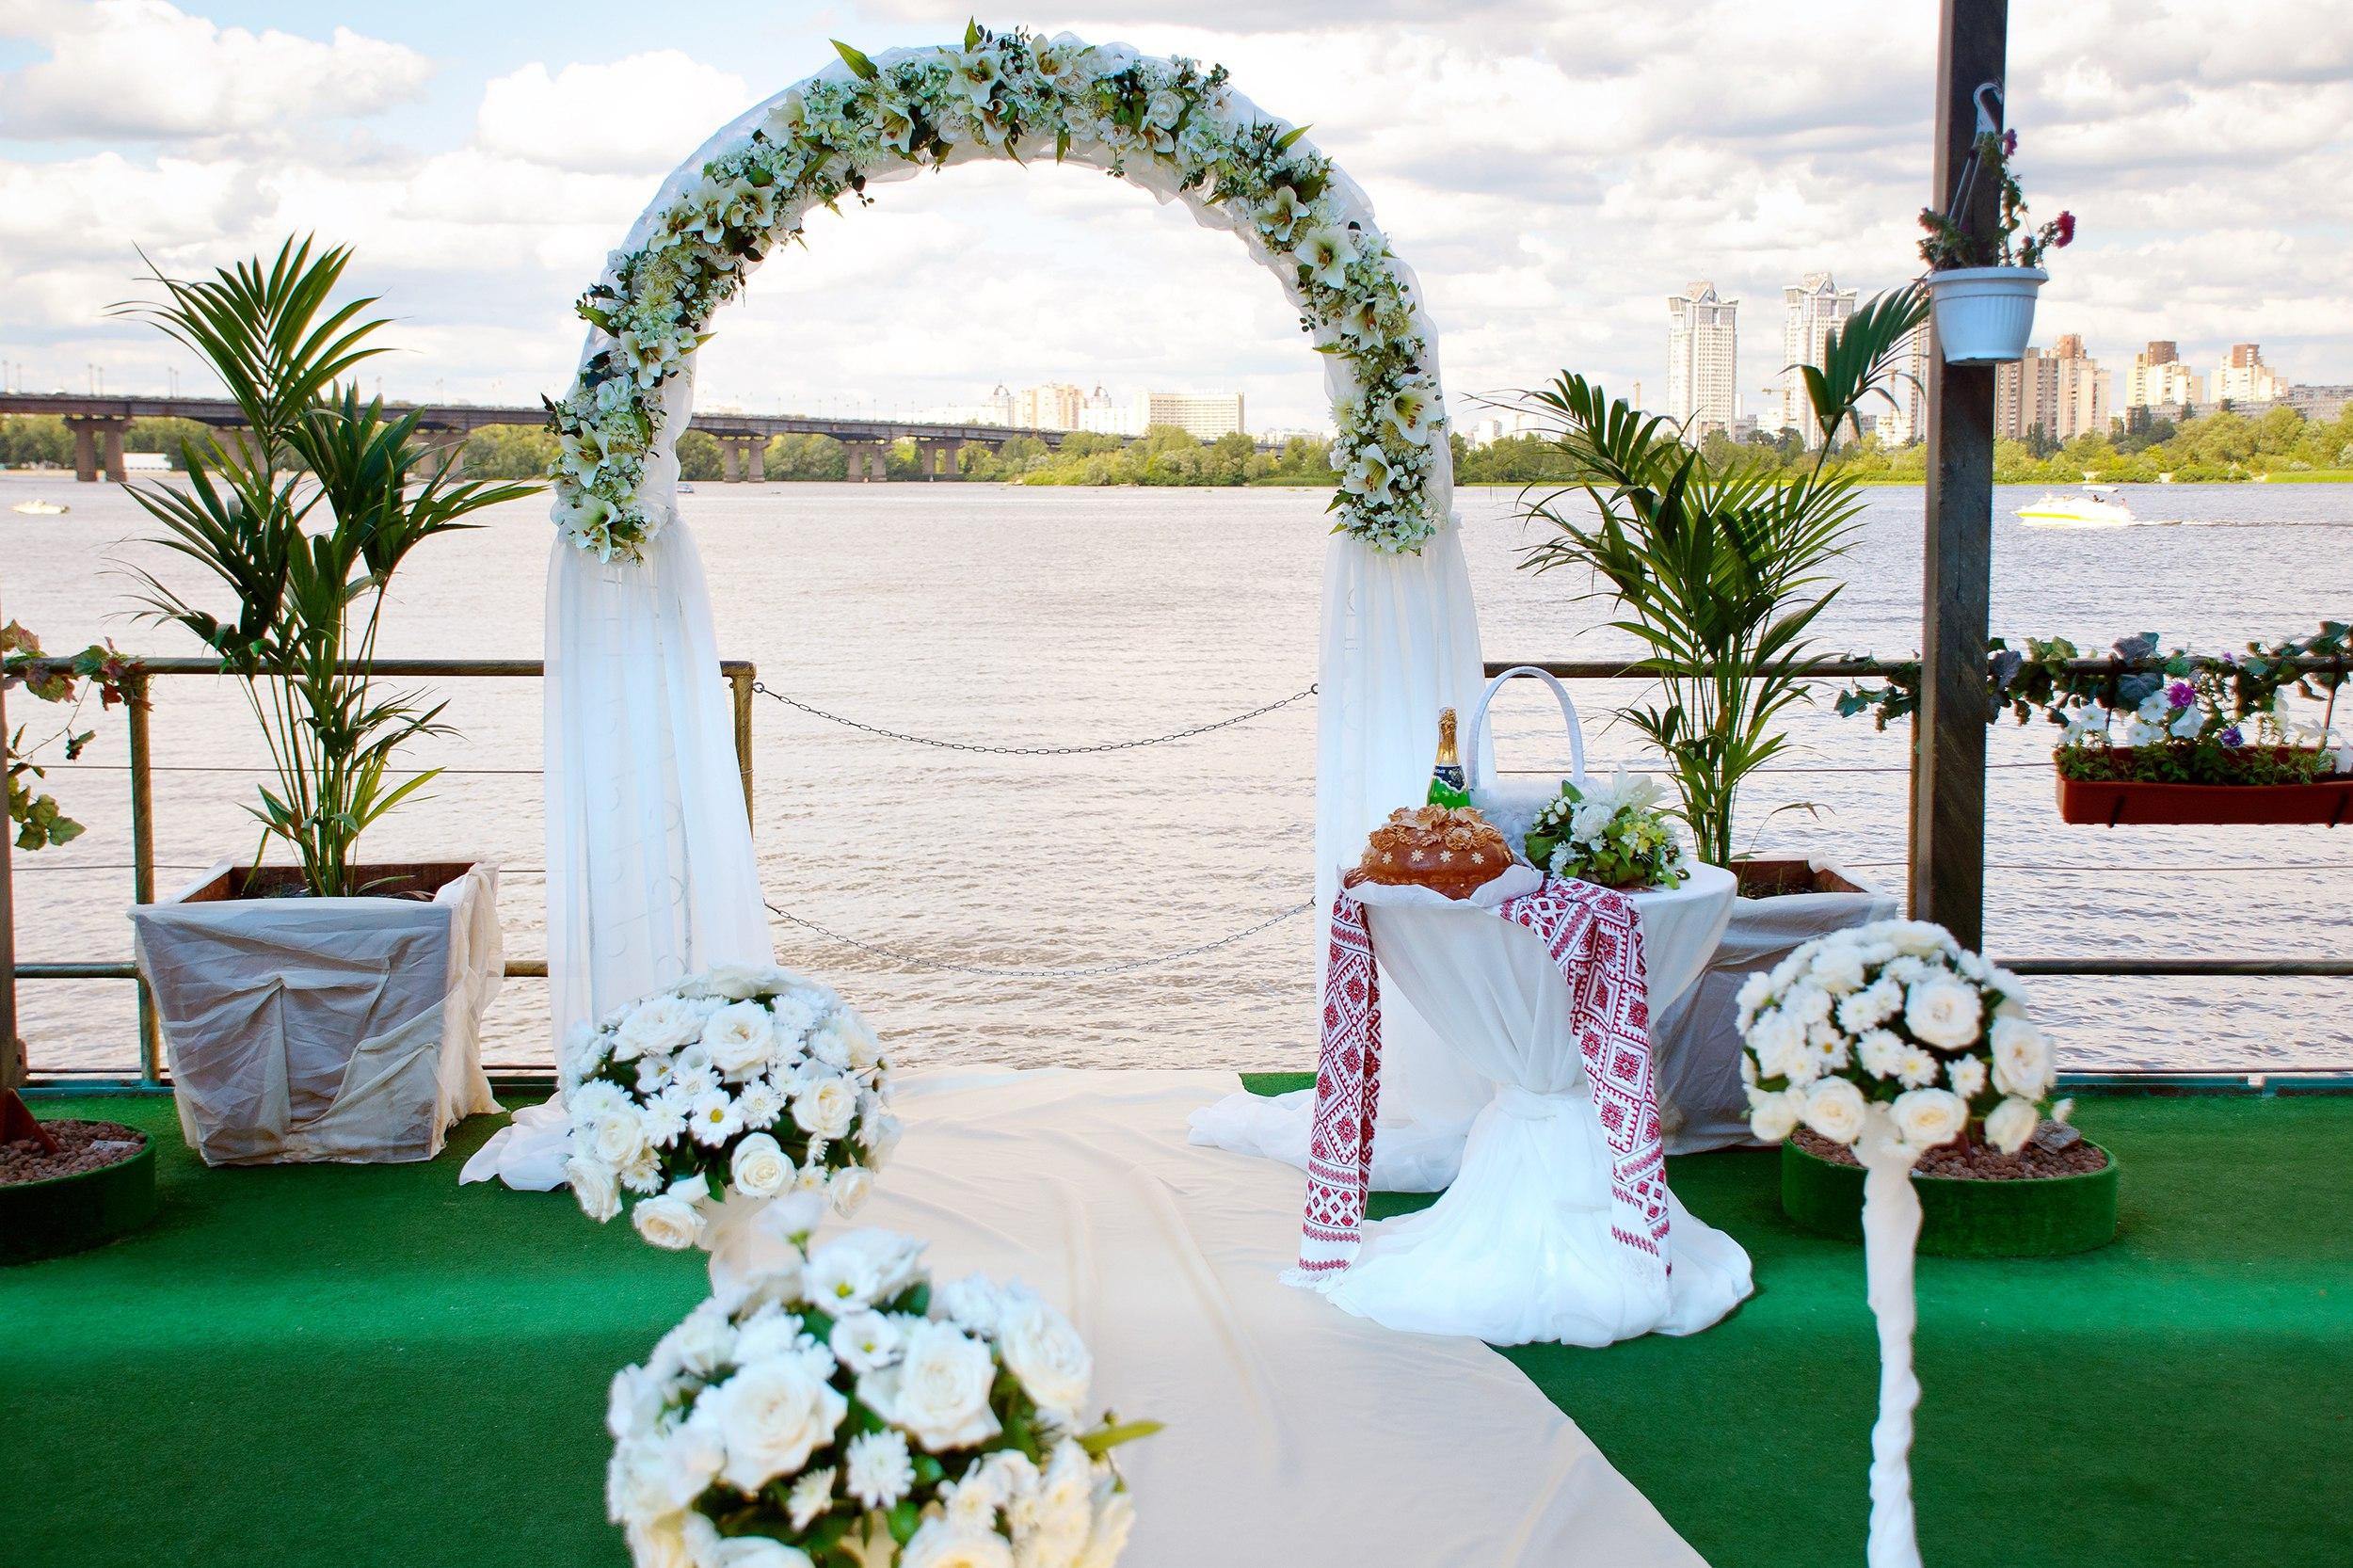 zCZFd0eIKkc - Классика ошибок на свадебной фотосессии